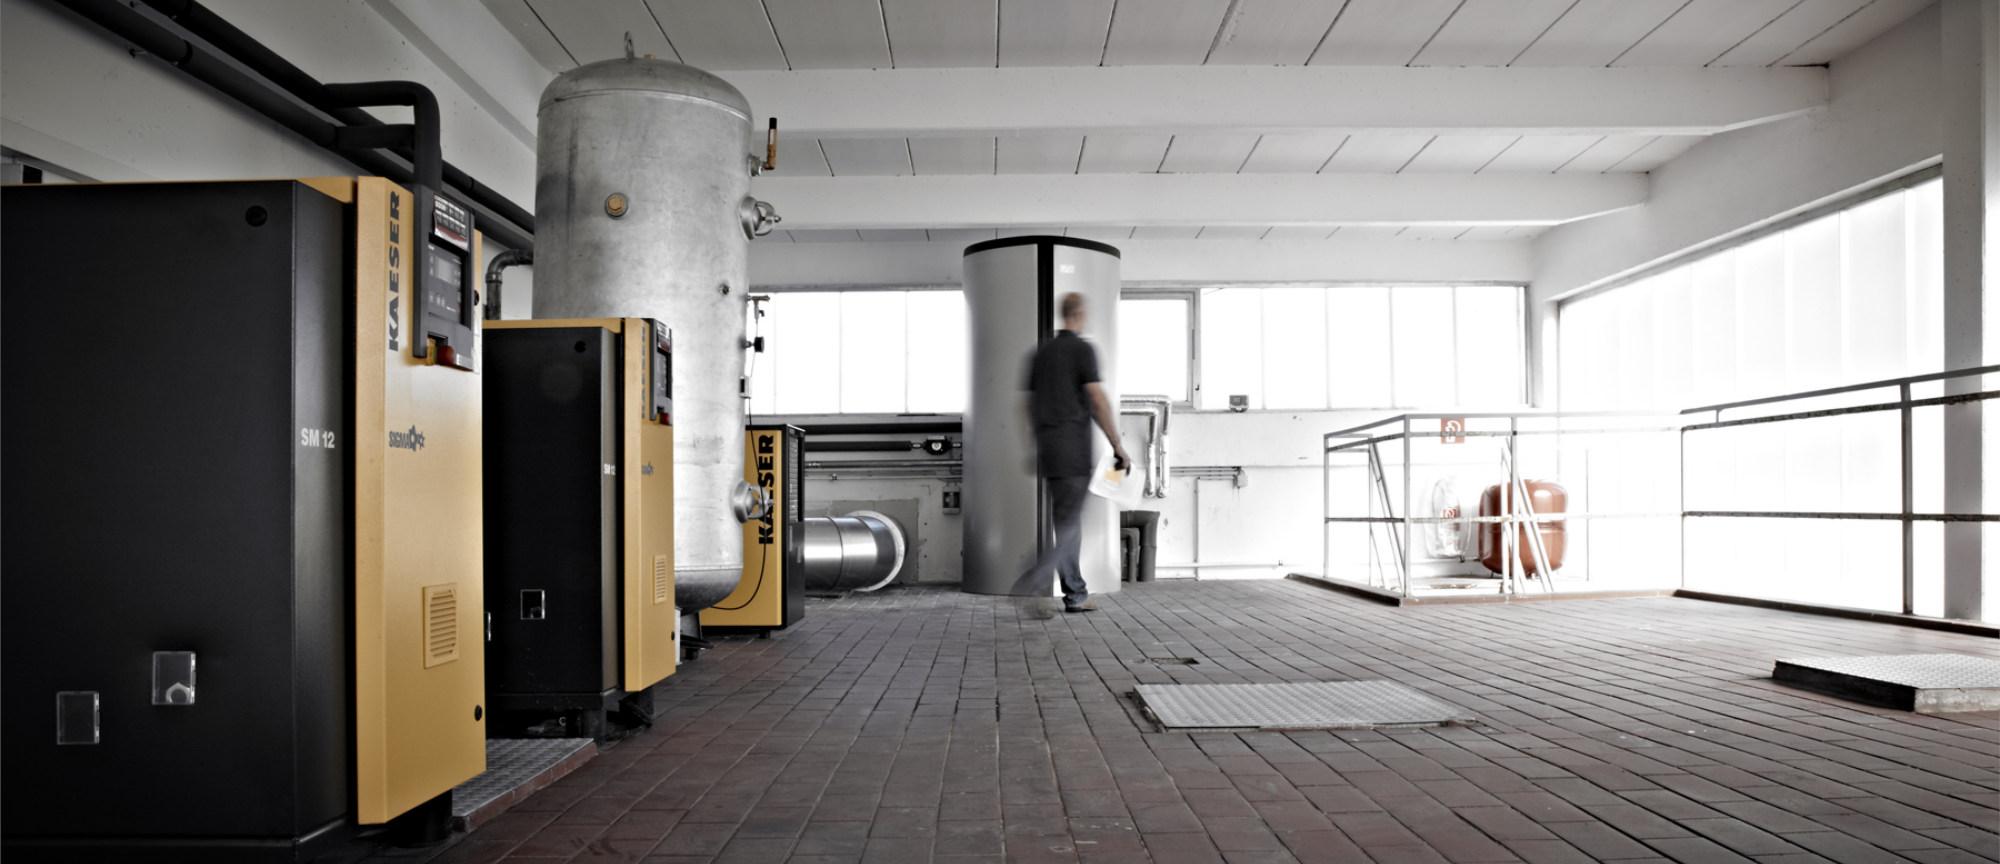 Production_compressors